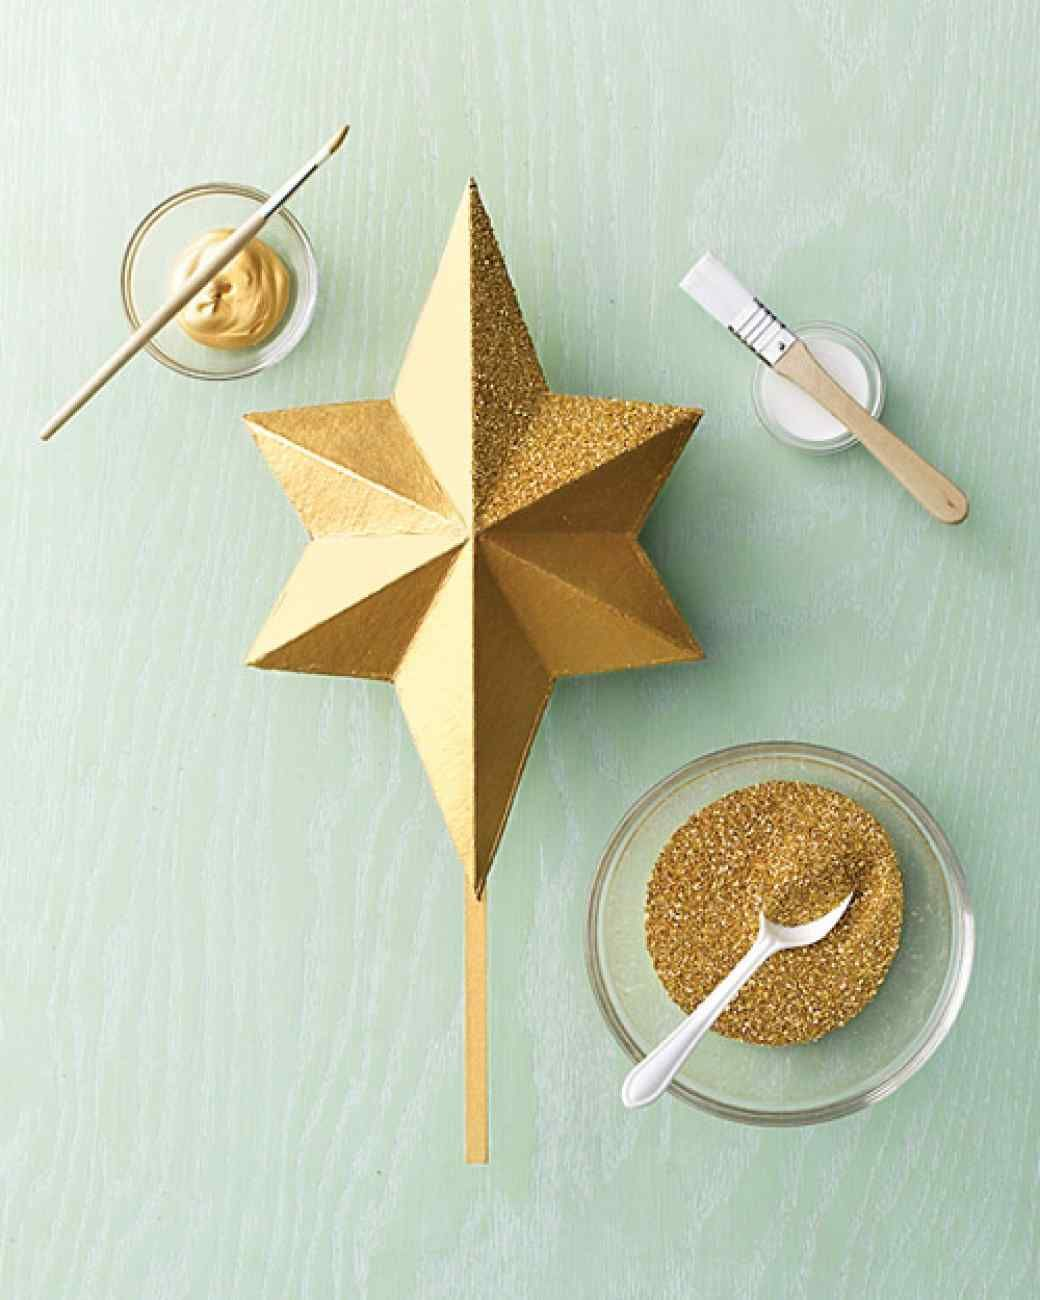 Martha Stewart Christmas Tree Topper: Martha's Glittered Star Tree Topper